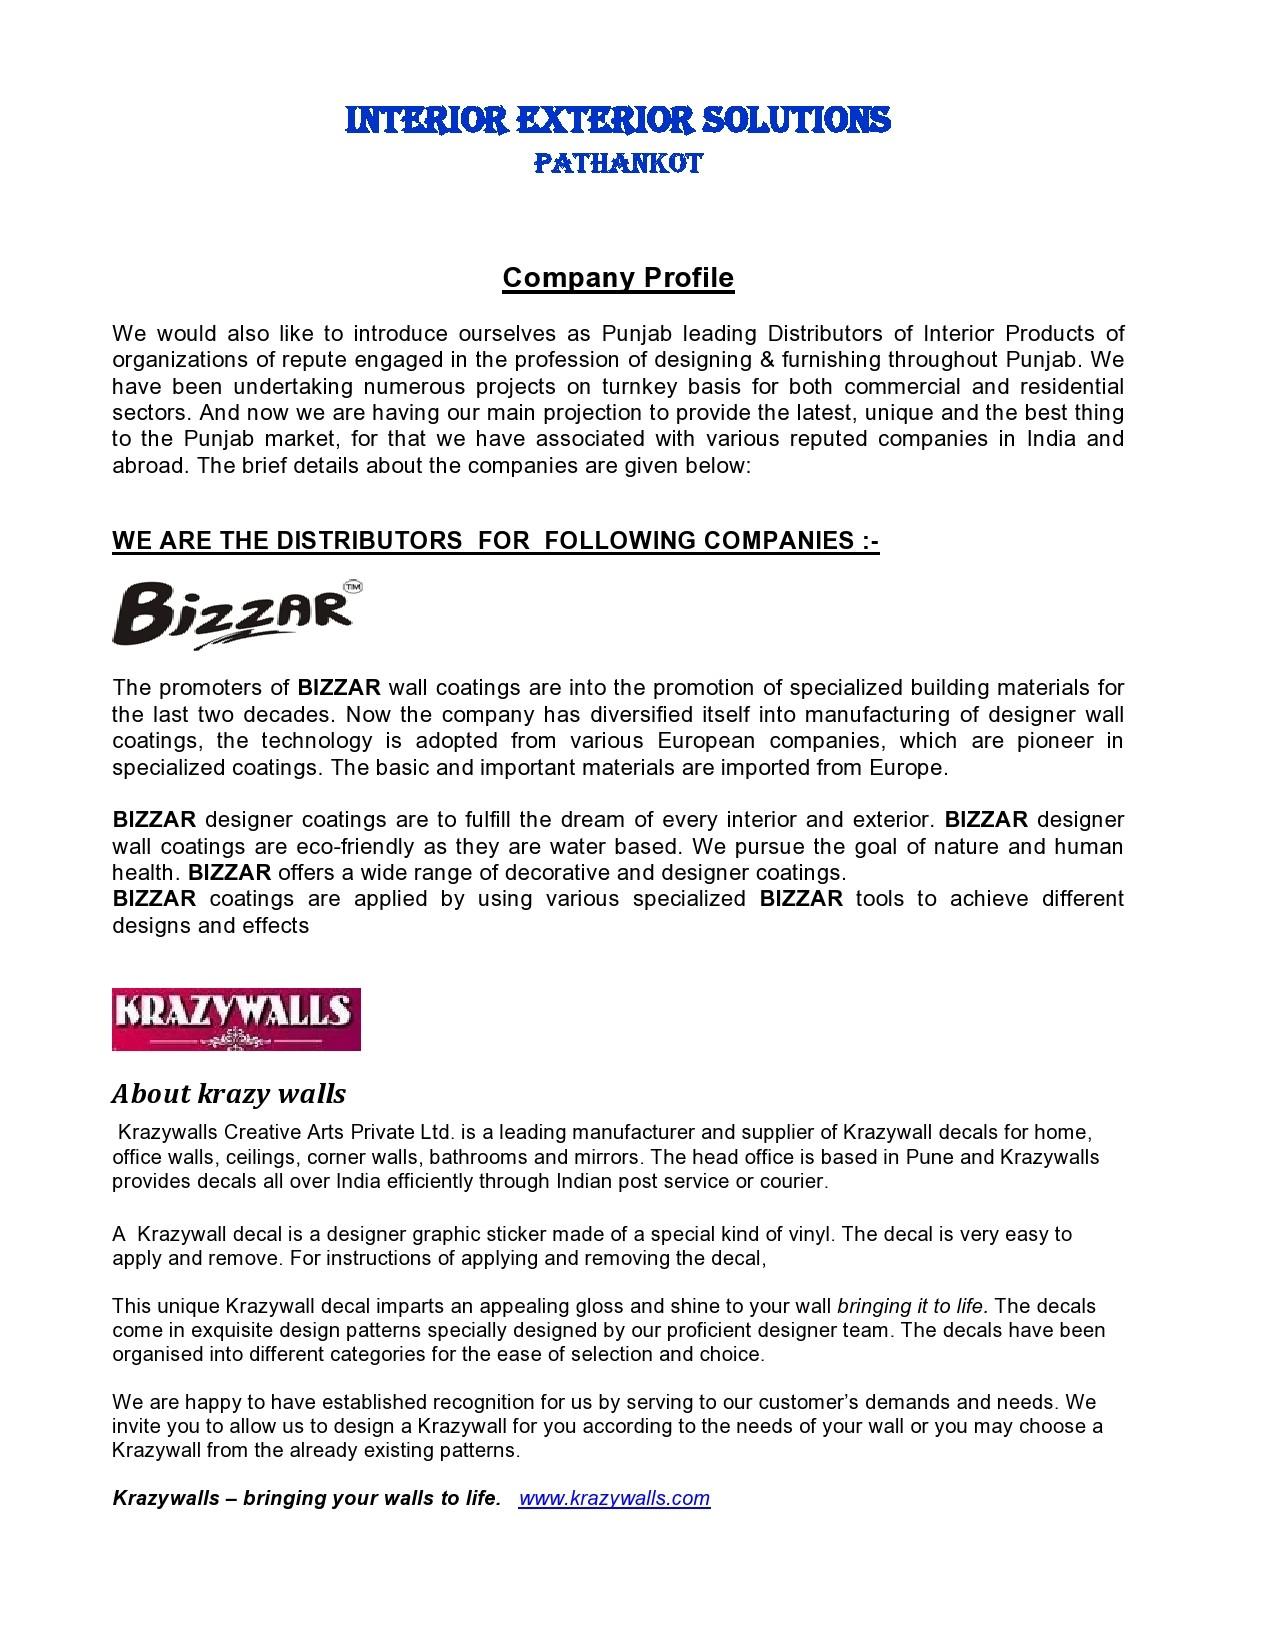 Free company profile template 31